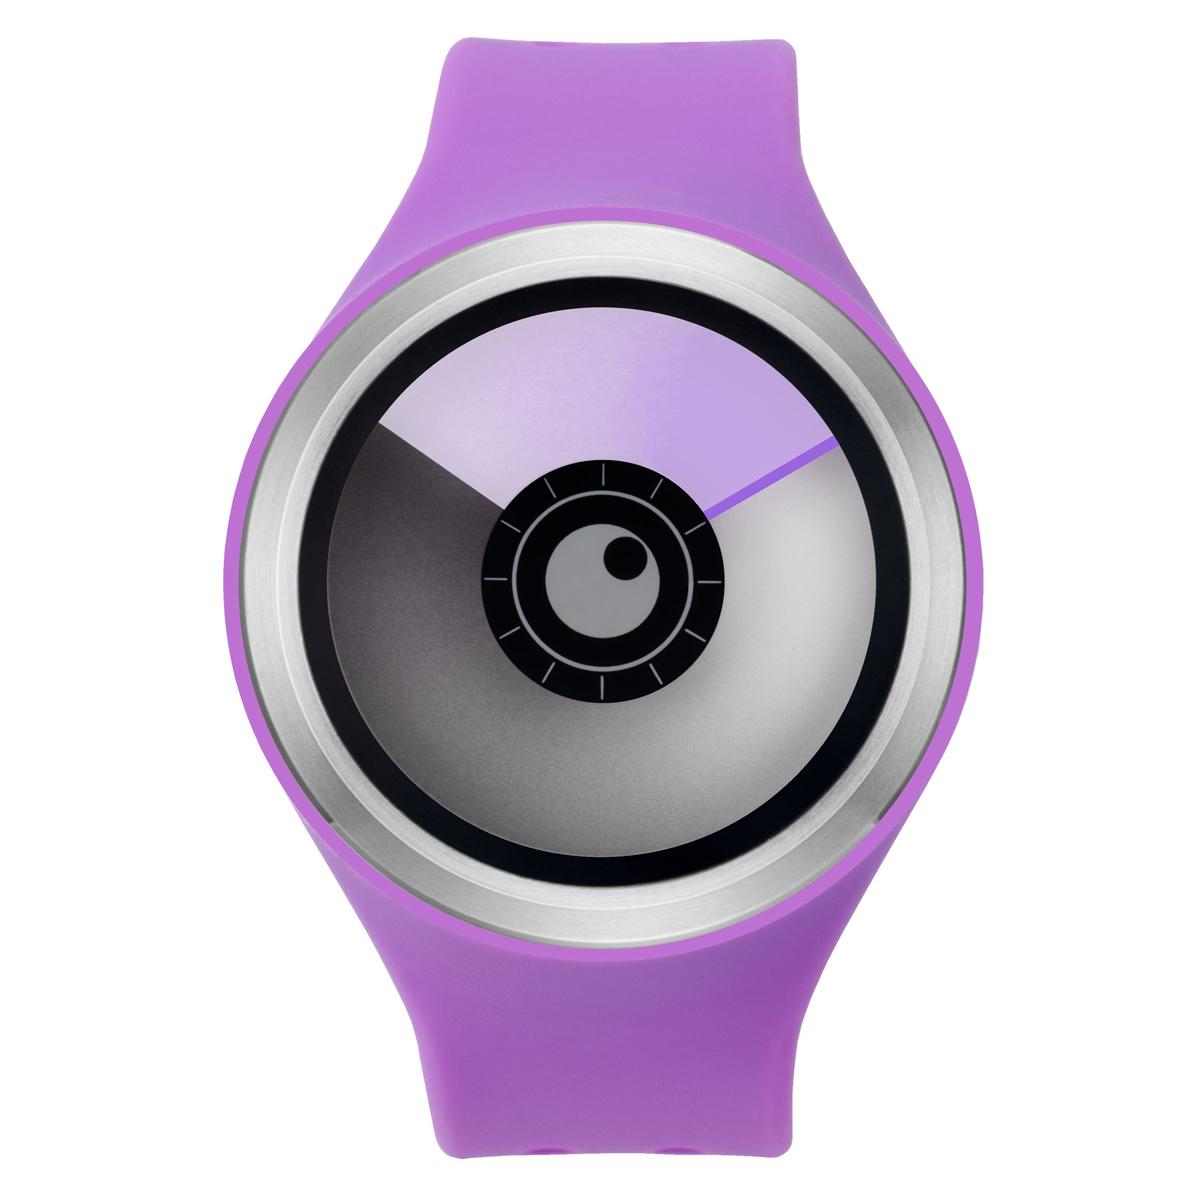 ZEROO AURORA BOREALIS ゼロ 電池式クォーツ 腕時計 [W00704B01SR08] パープル デザインウォッチ ペア用 メンズ レディース ユニセックス おしゃれ時計 デザイナーズ